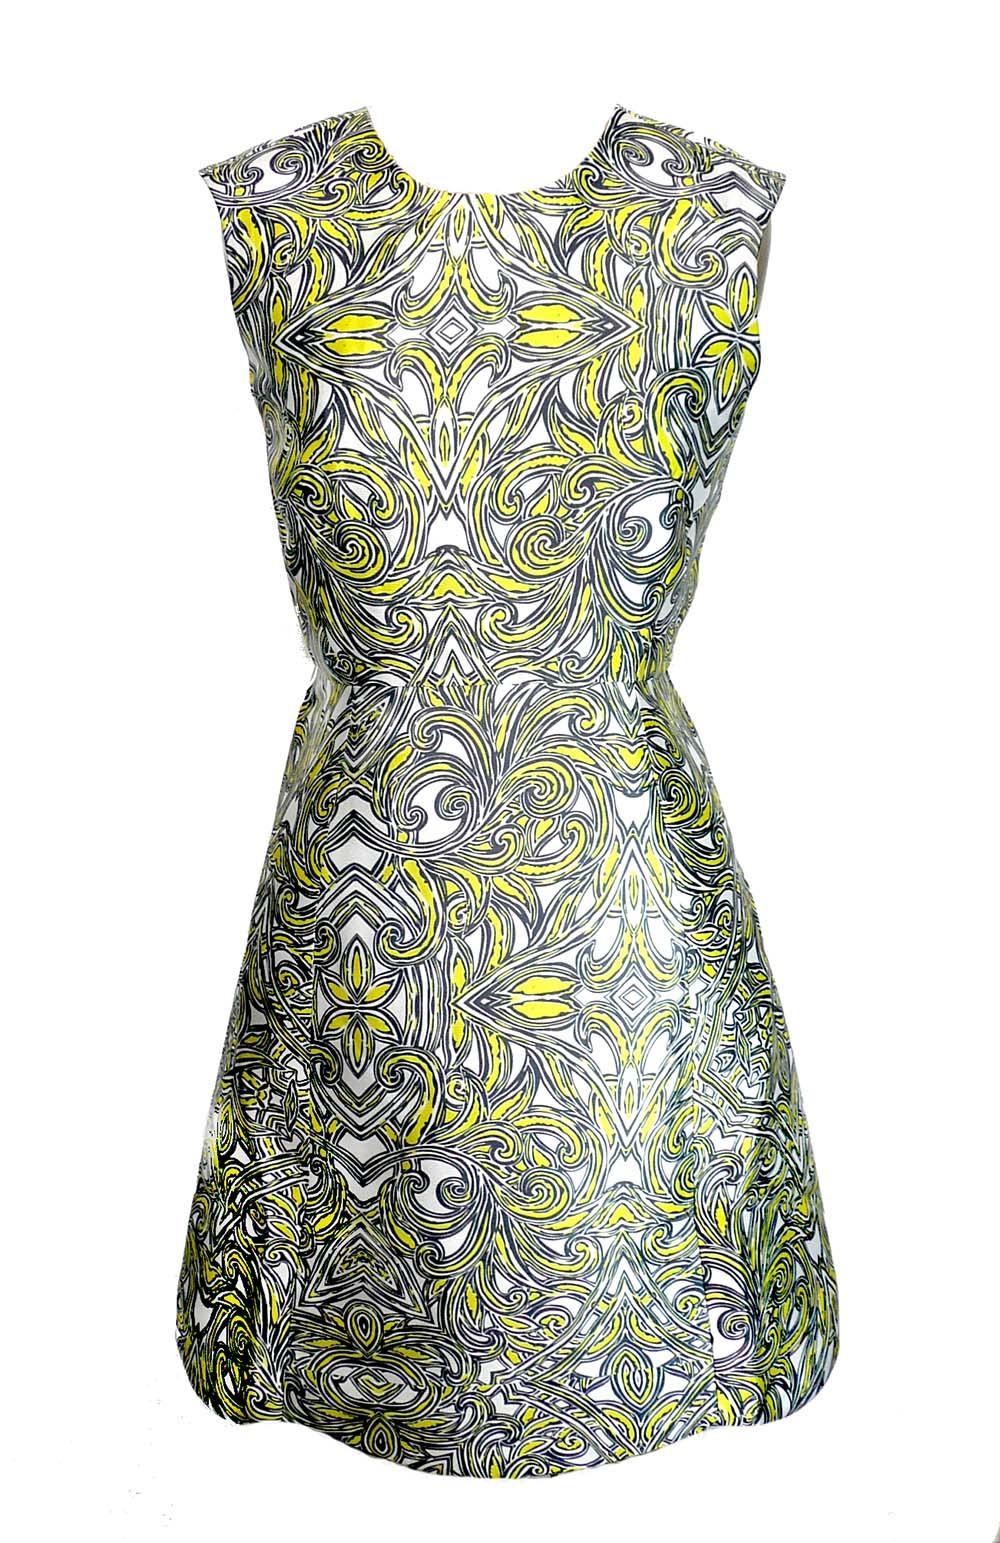 dress grn satin print.jpg